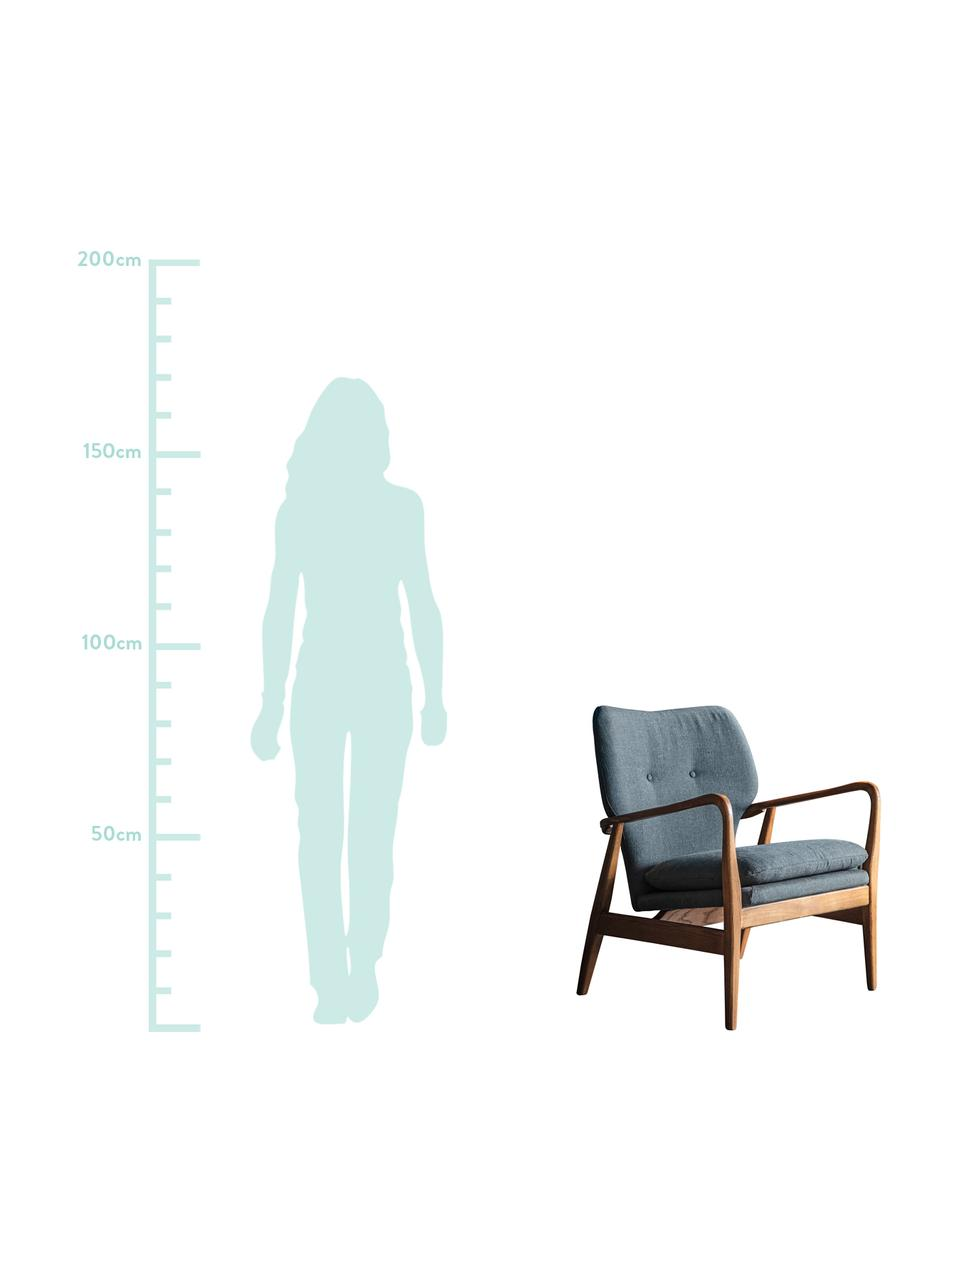 Loungefauteuil Jomlin van eikenhout, Bekleding: linnen, Frame: eikenhout, Donkergrijs, 70 x 60 cm